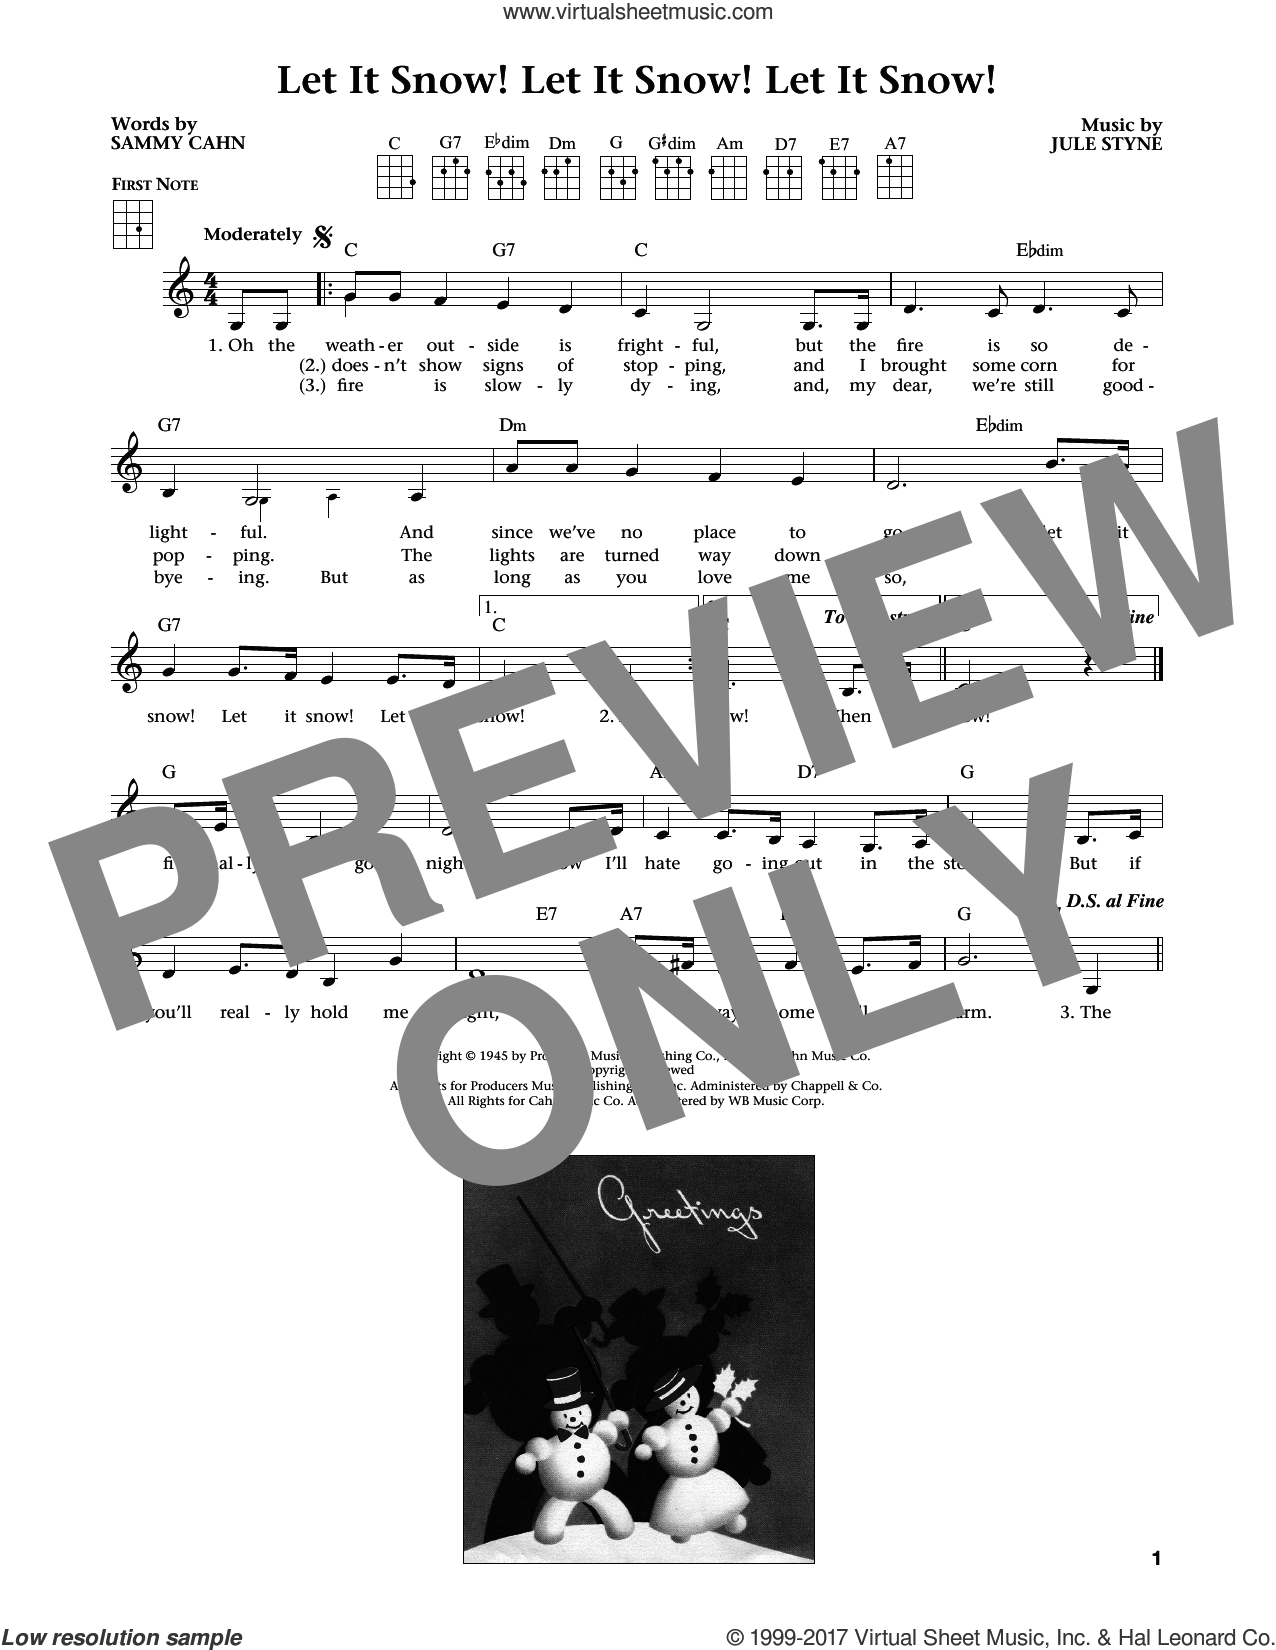 Let It Snow! Let It Snow! Let It Snow! (from The Daily Ukulele) (arr. Liz and Jim Beloff) sheet music for ukulele by Sammy Cahn and Jule Styne, intermediate skill level